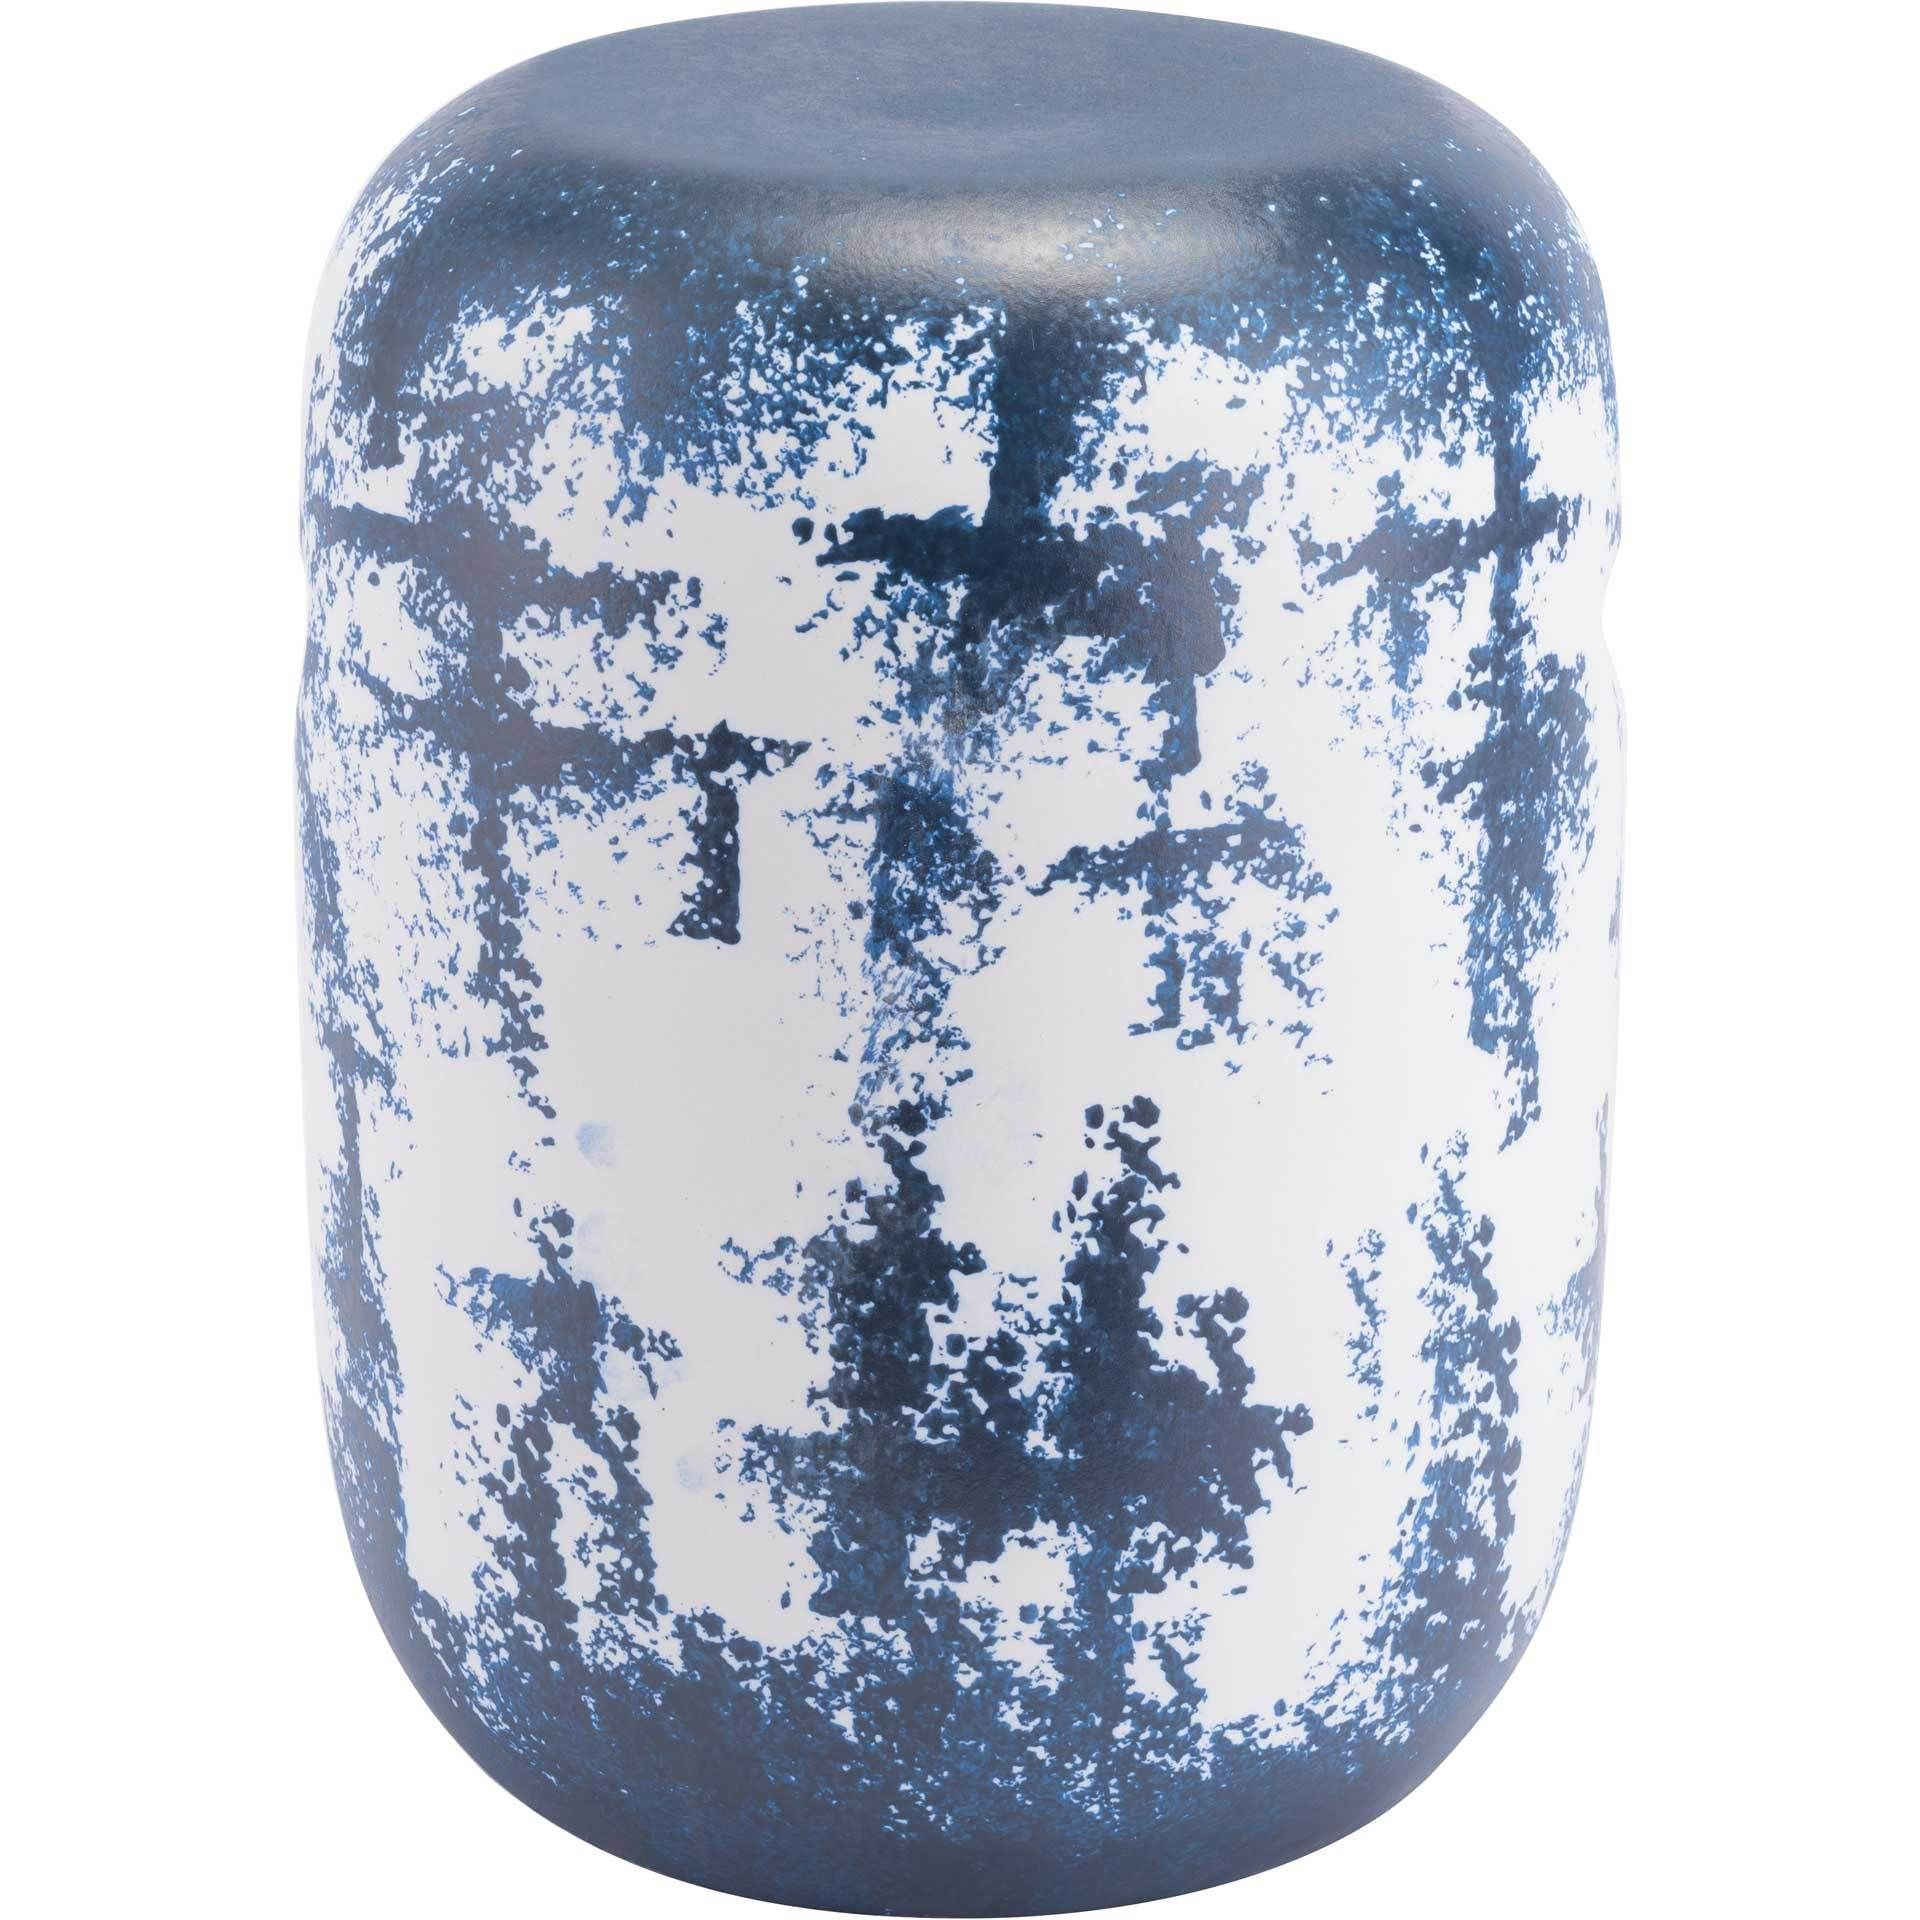 Mar Garden Seat White/Blue | Garden Stool, Outdoor Stools With Winterview Garden Stools (View 17 of 25)